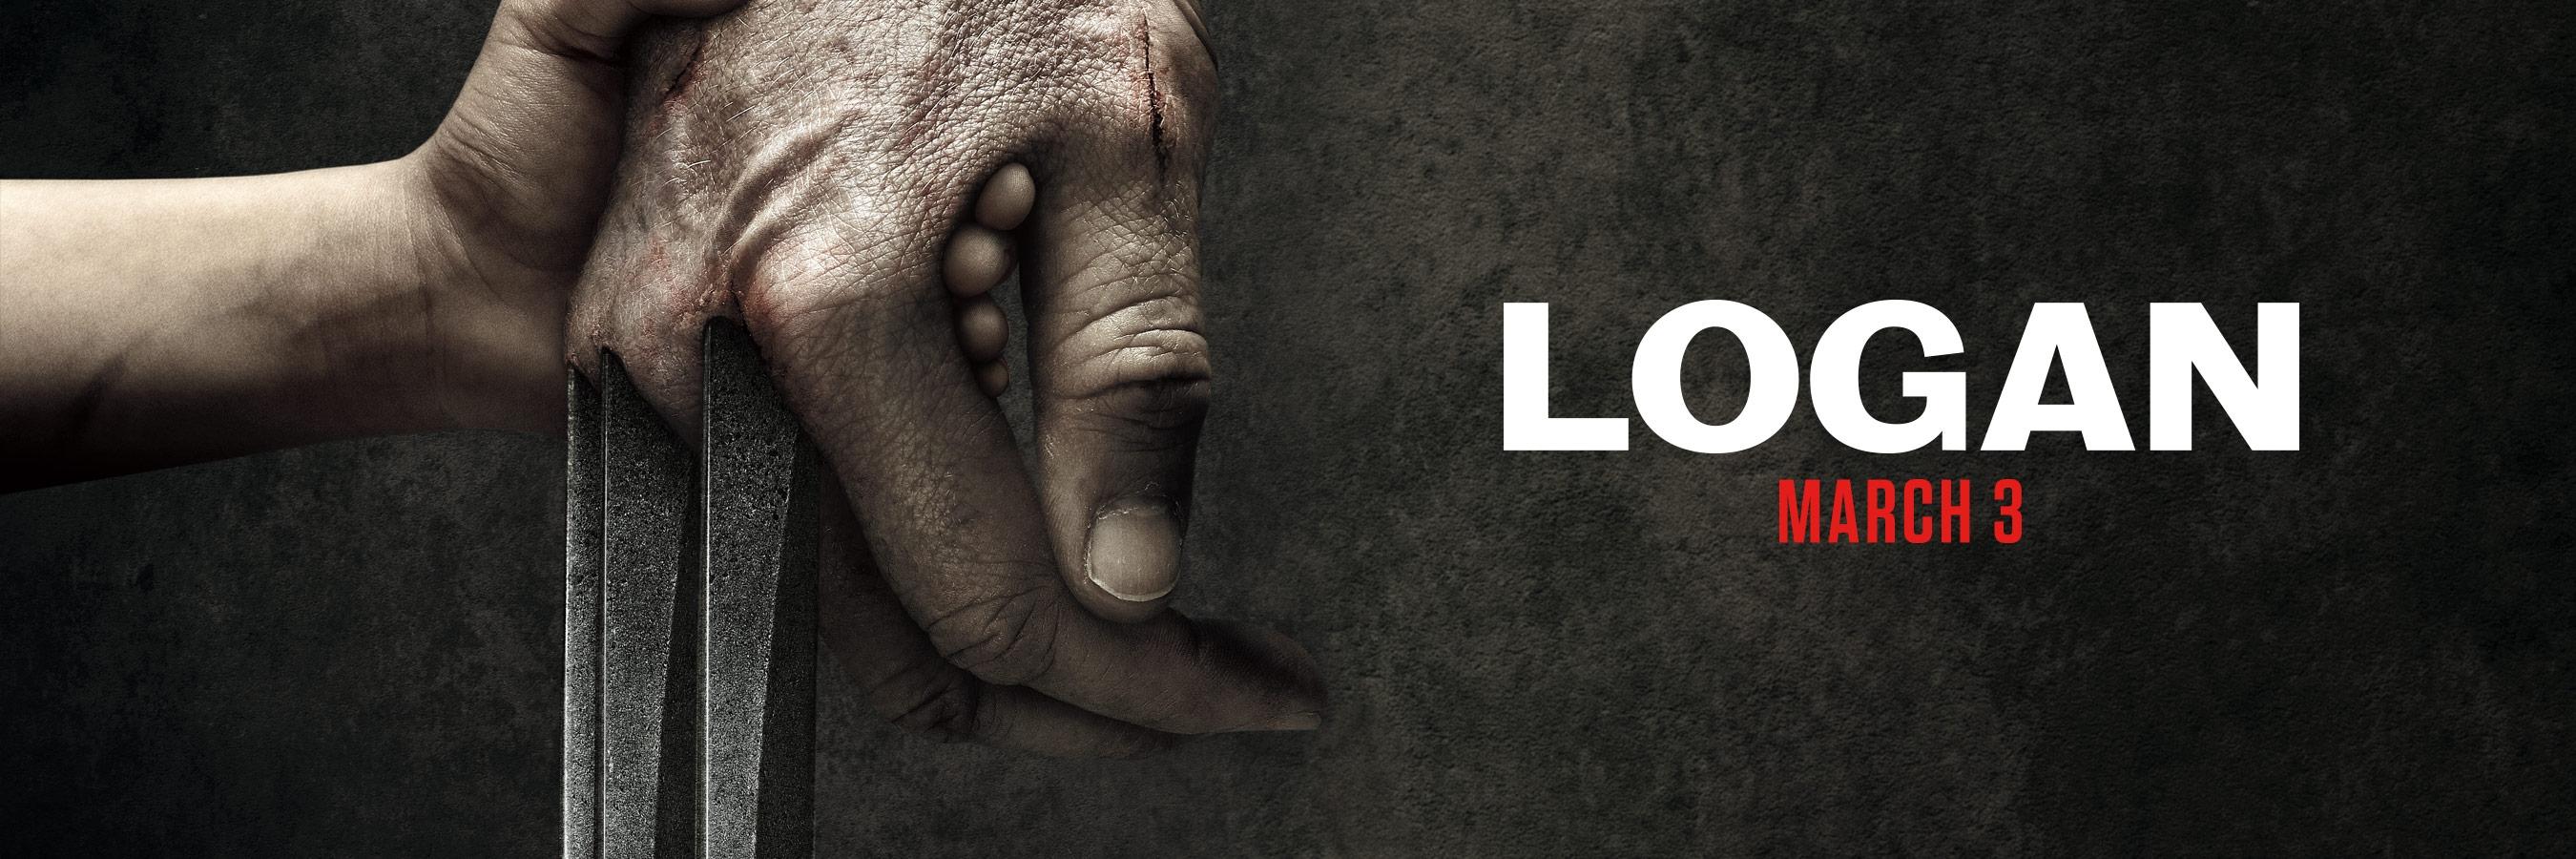 Logan 2017 Movie